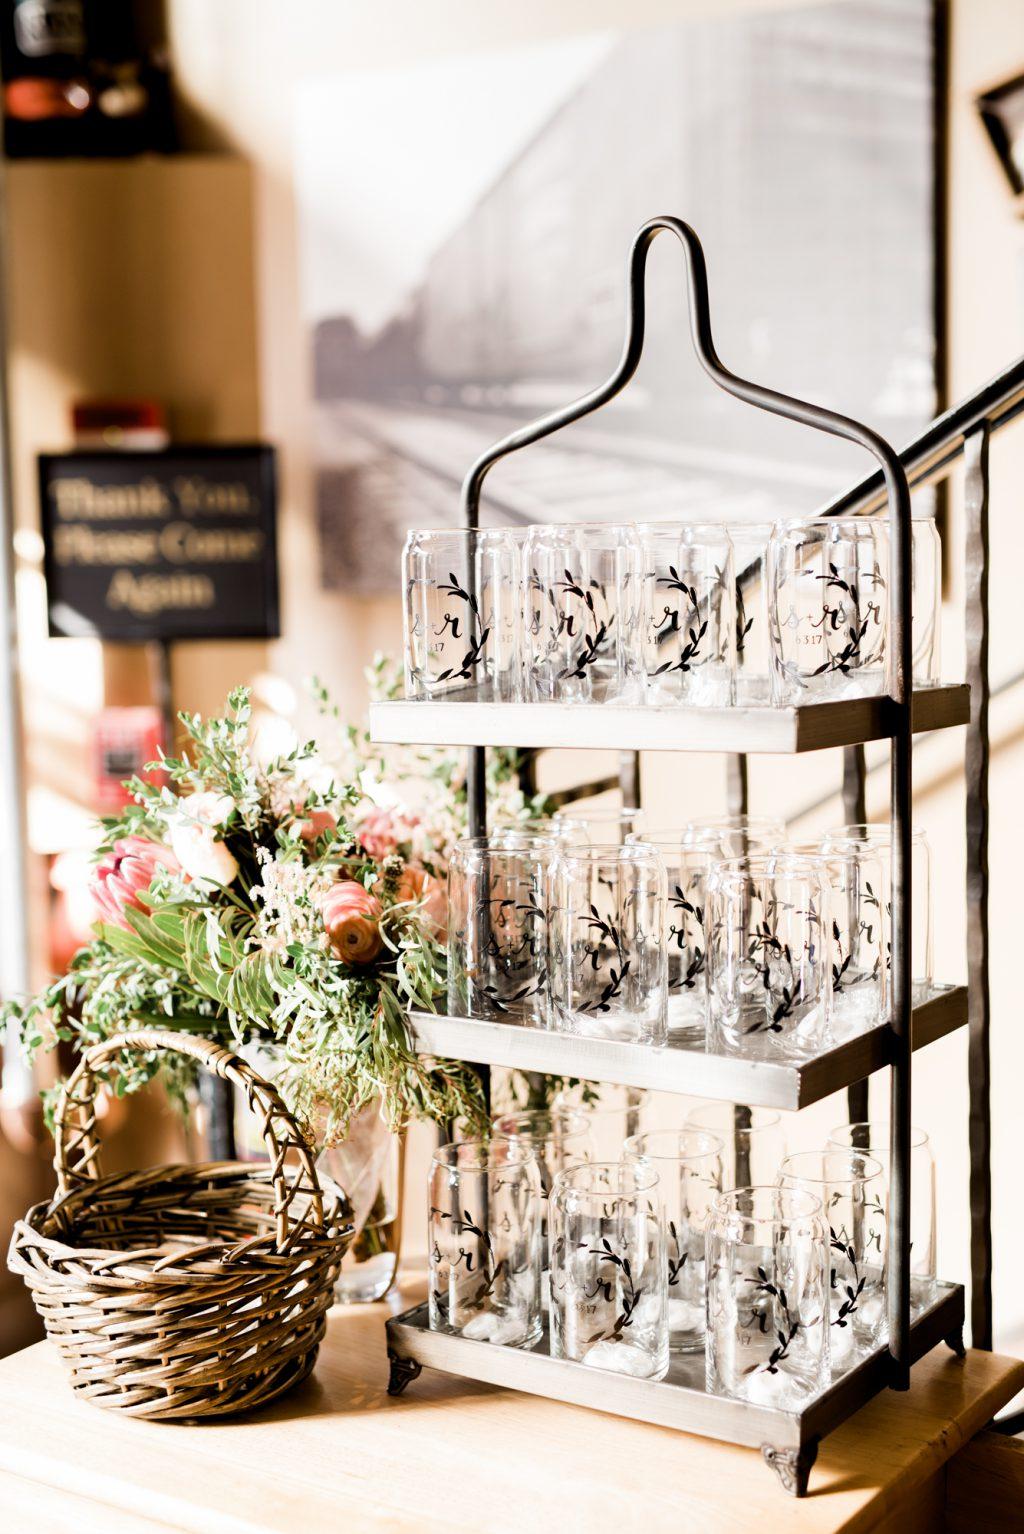 haley-richter-photo-west-chester-summer-wedding-boxcar-brewery-159